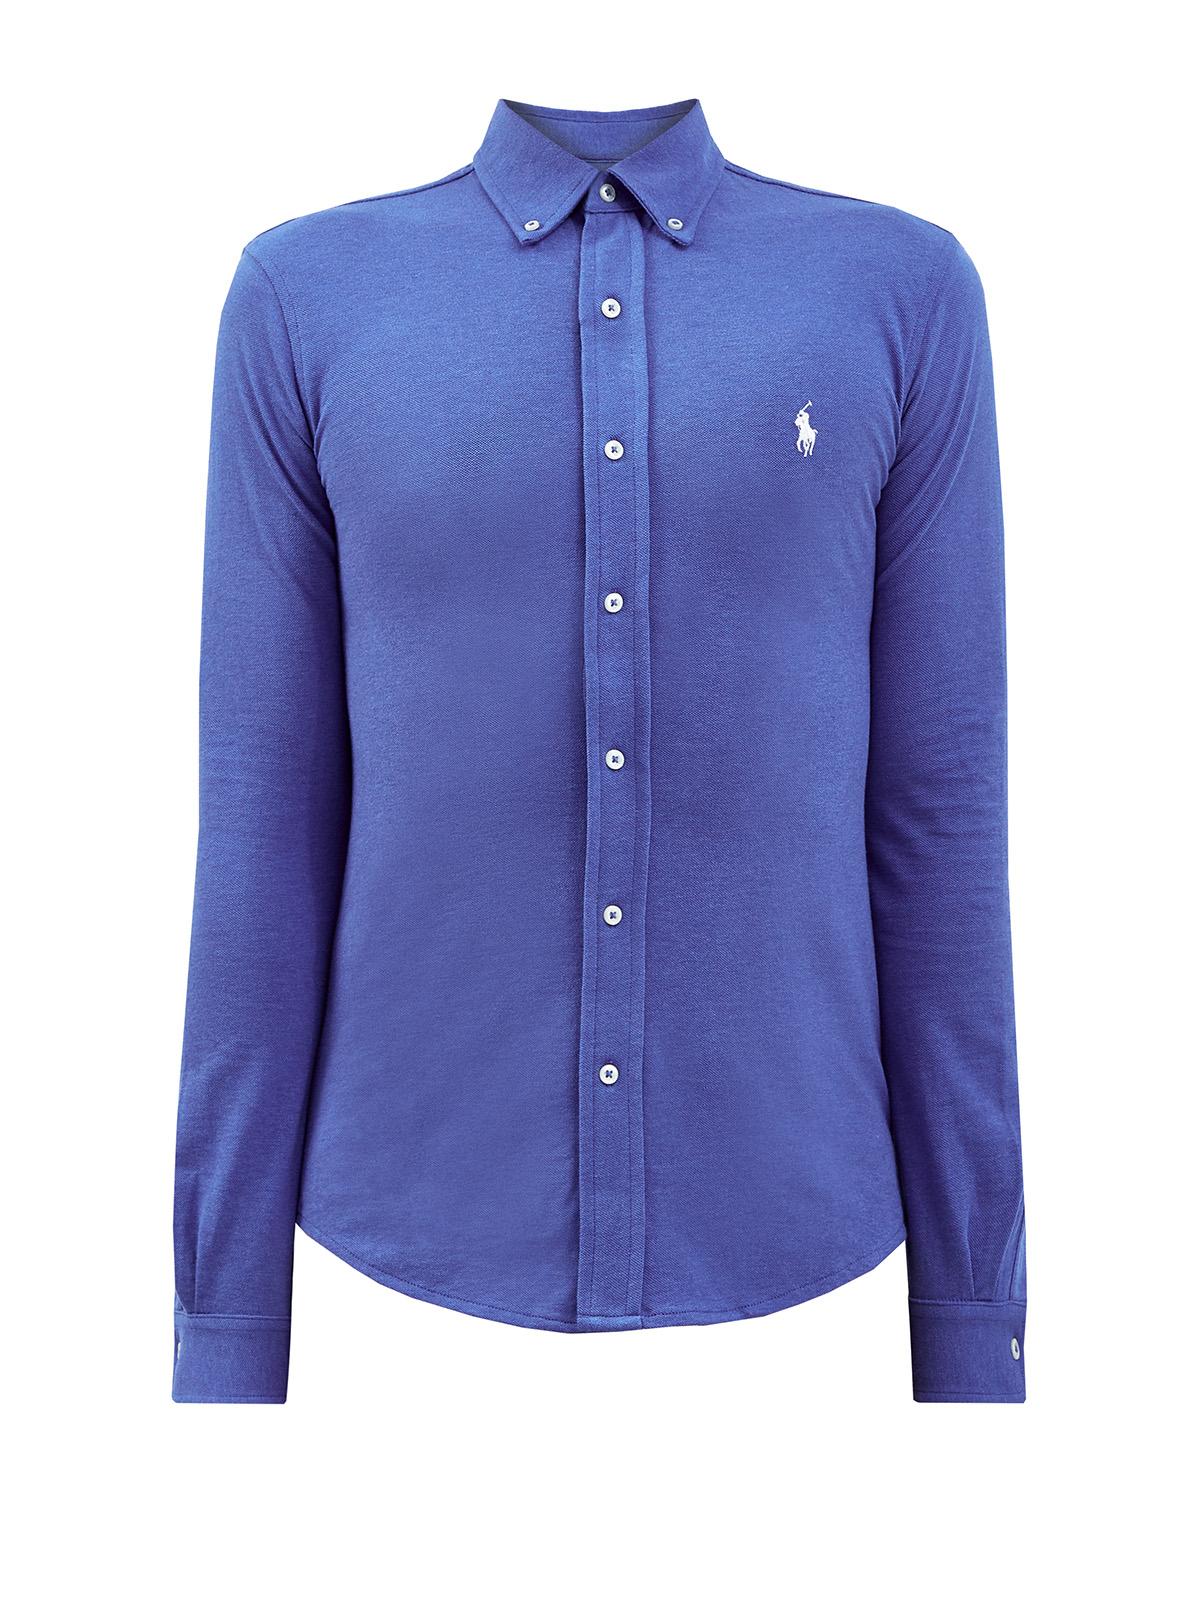 Хлопковая рубашка с воротником button-down